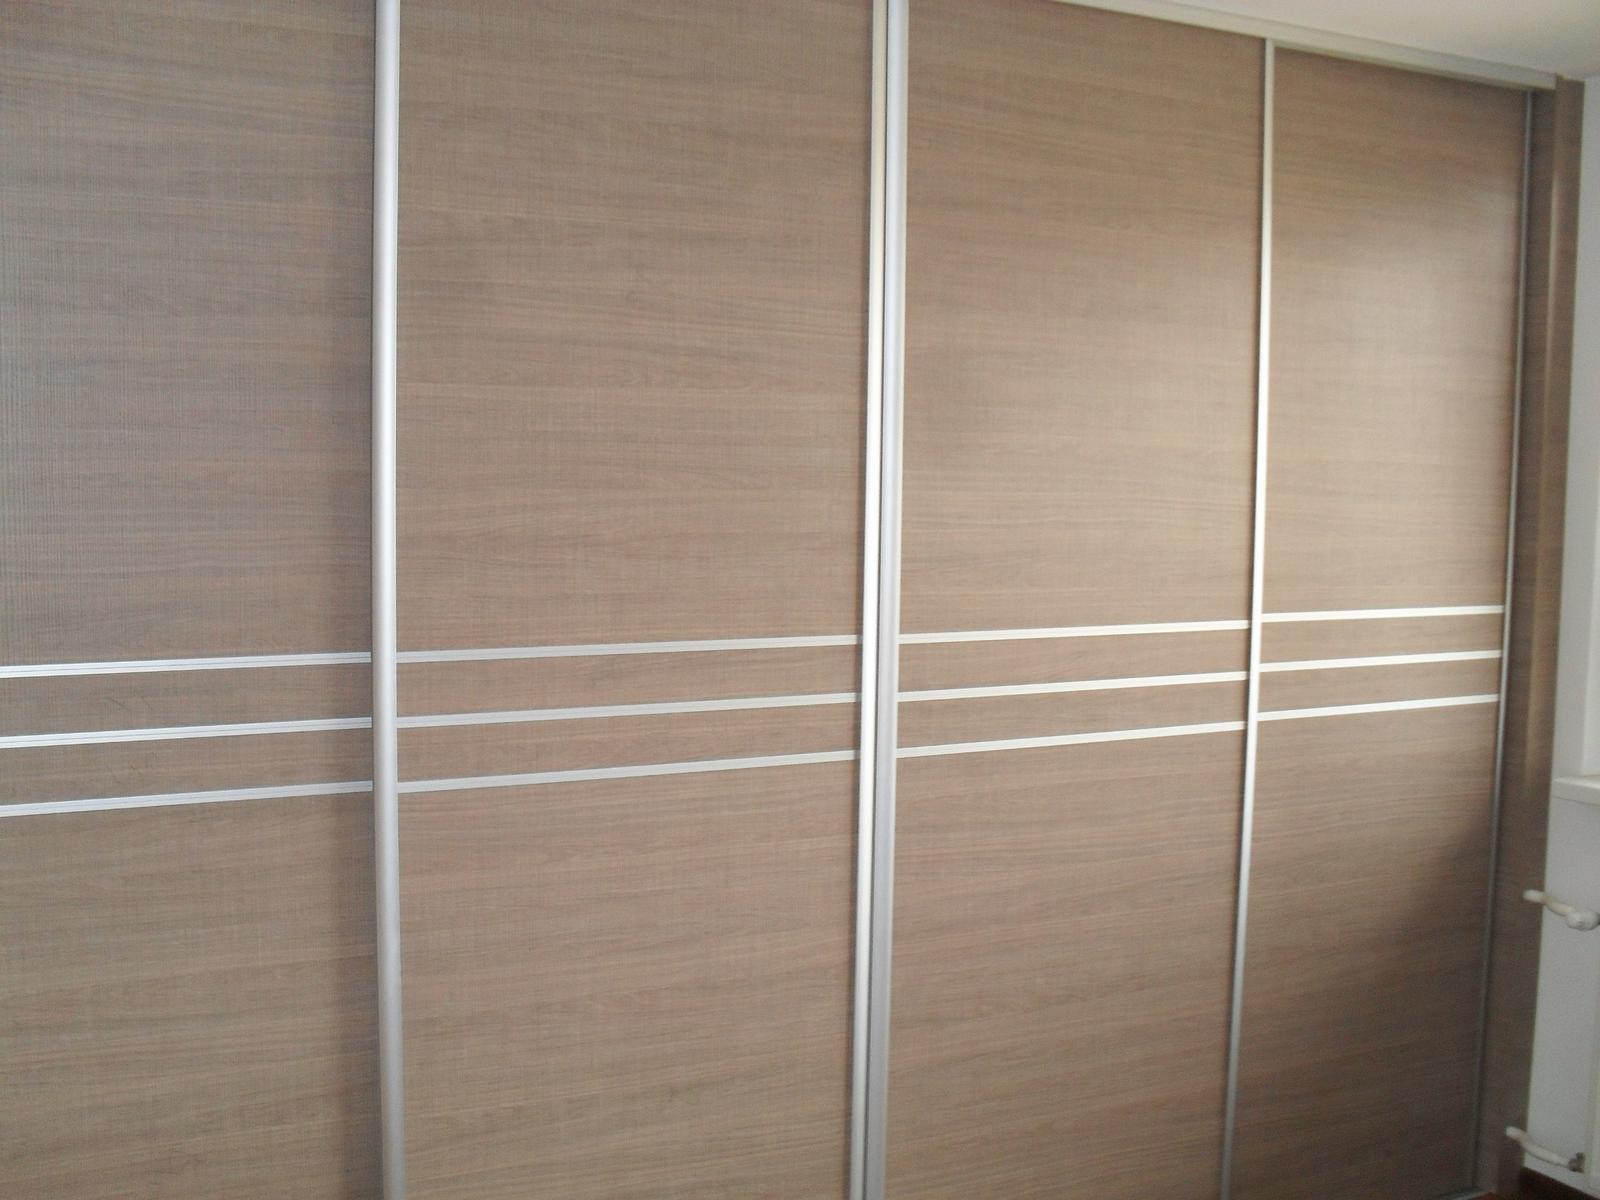 Vstavané skrine Martin Benko Bošany - Obrázok č. 24